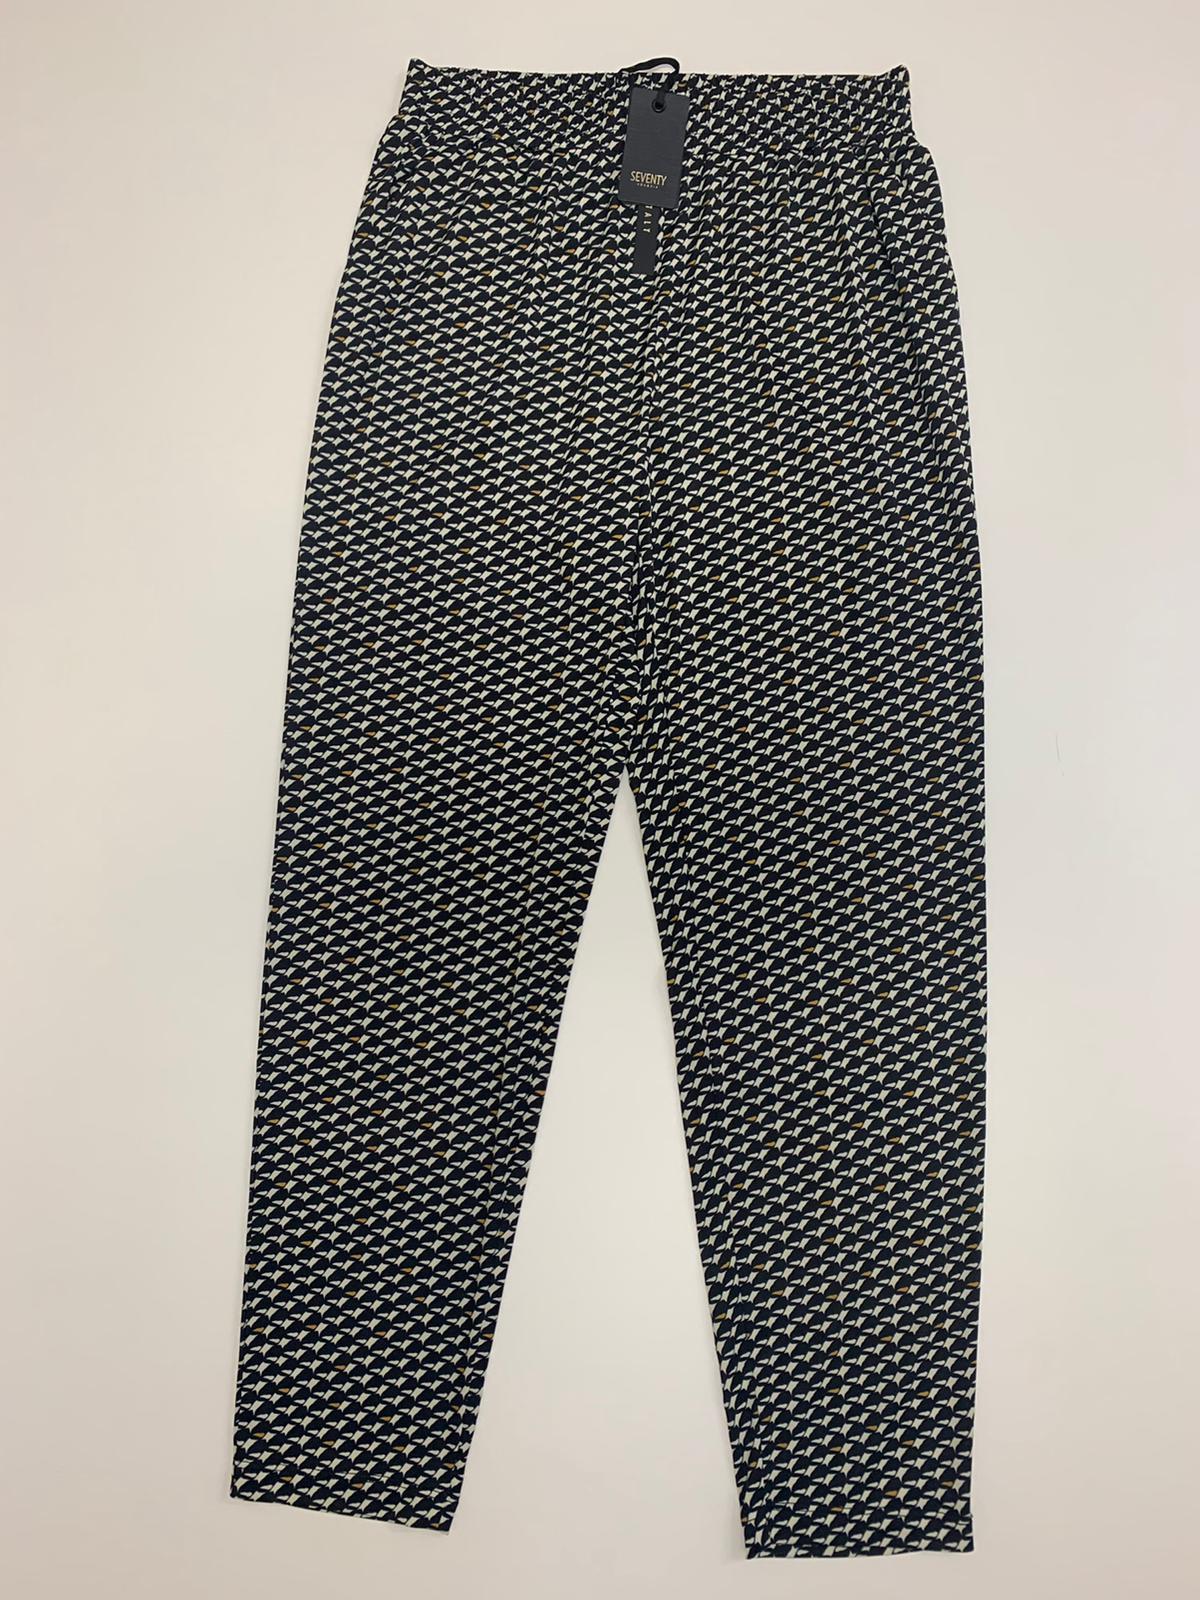 Pantalone Seventy Jersey Nero